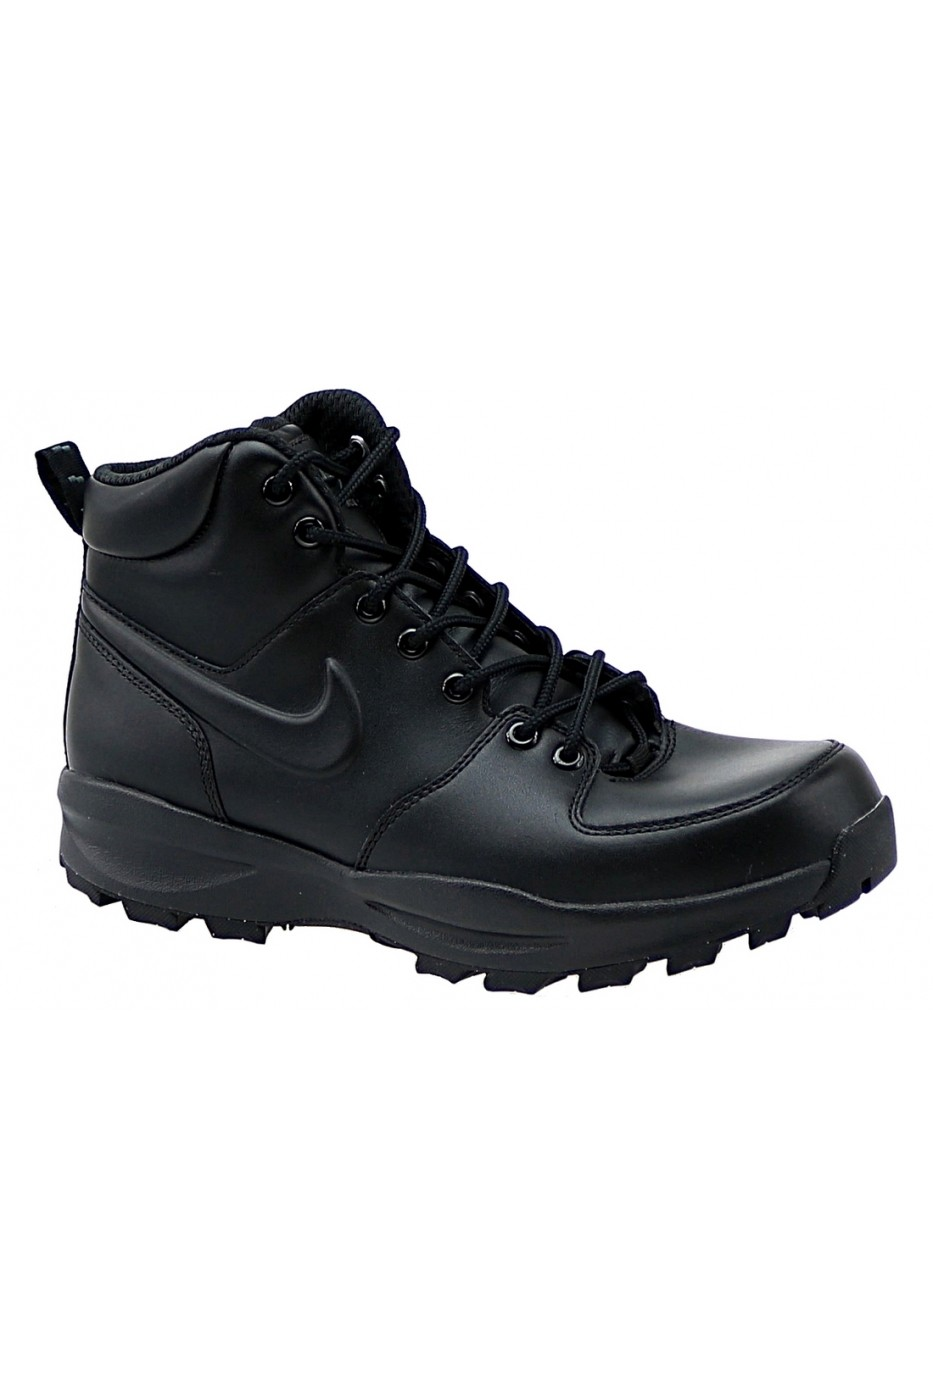 NIKE Téli cipő-bakancs BUT-454350-003 - FashionUP! 3b5c049884